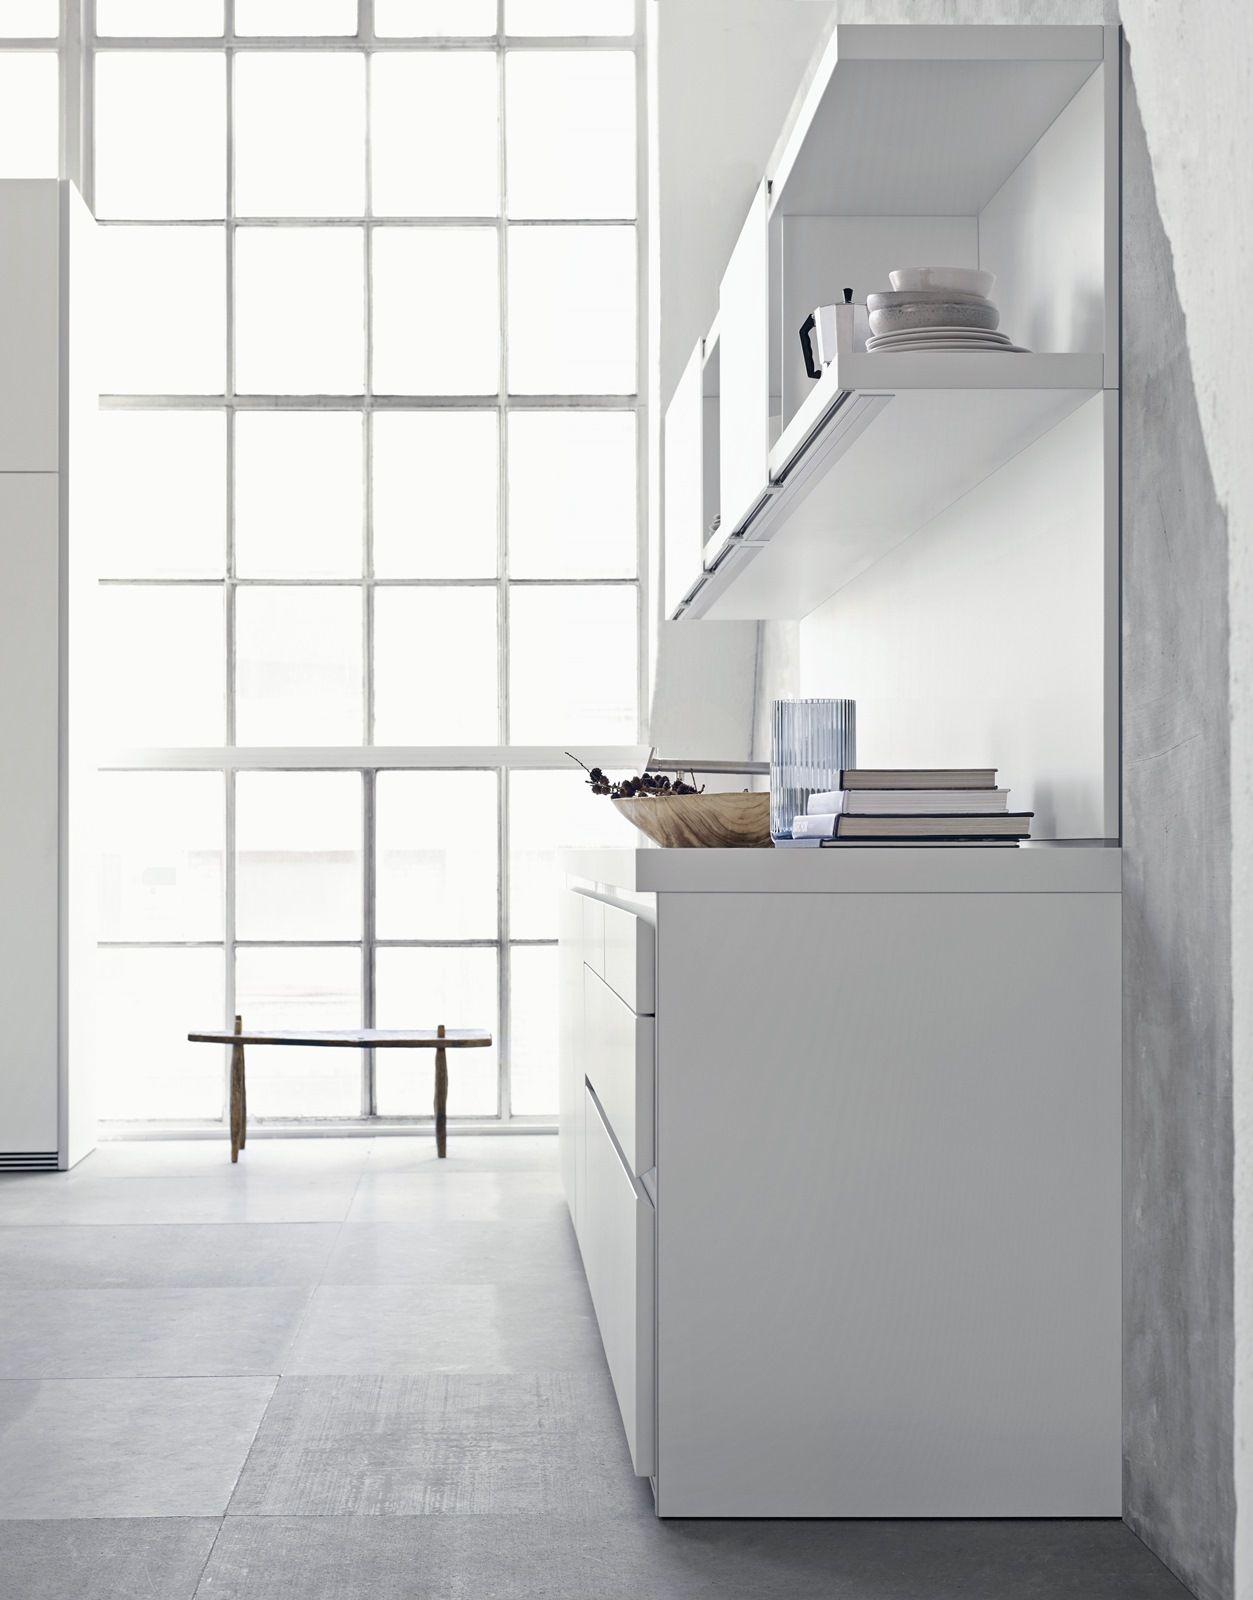 B1-Bulthaup   Küche   Pinterest   Küche